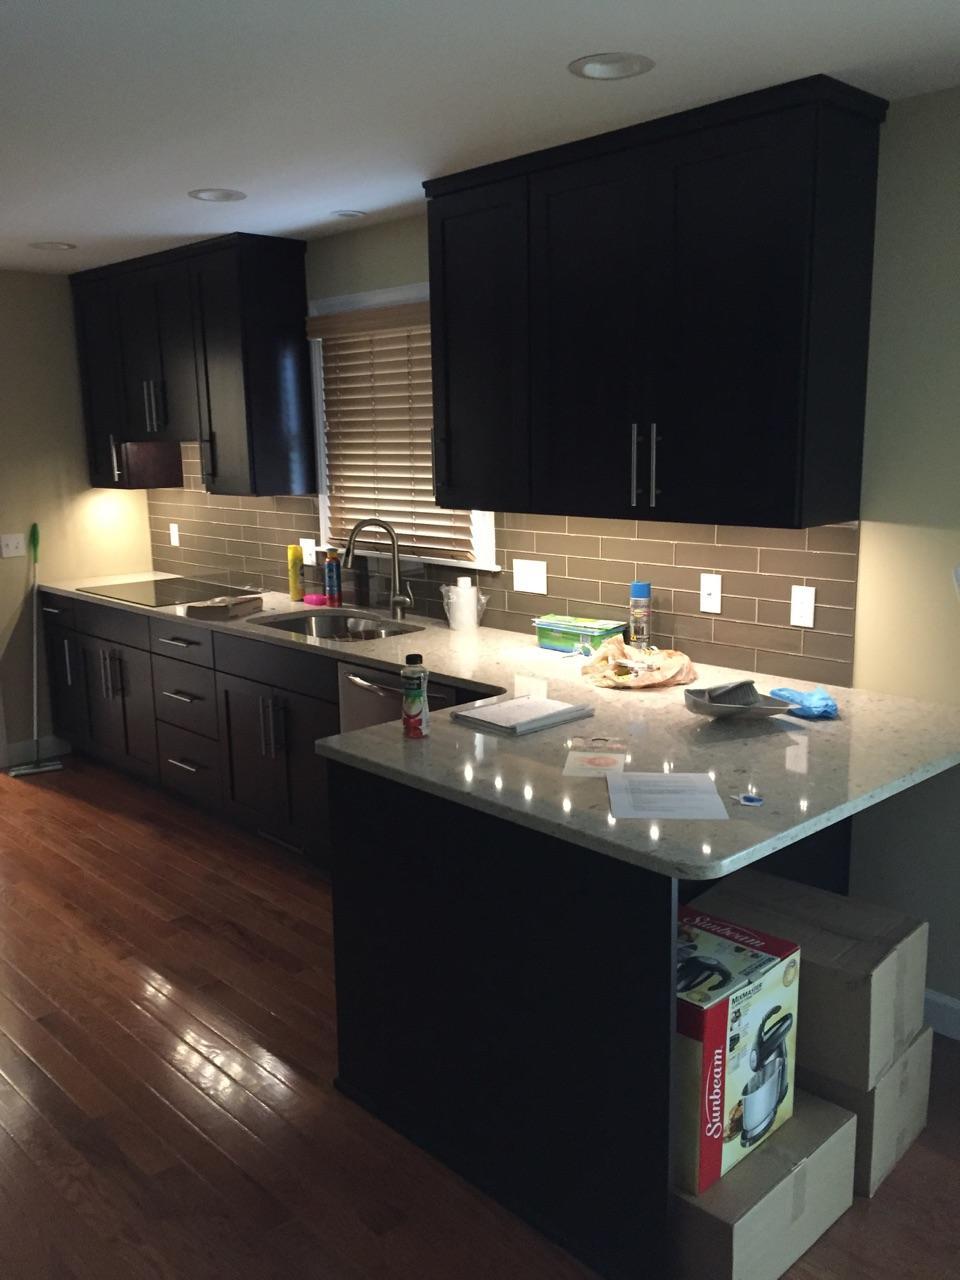 Finished Kitchen Lighting